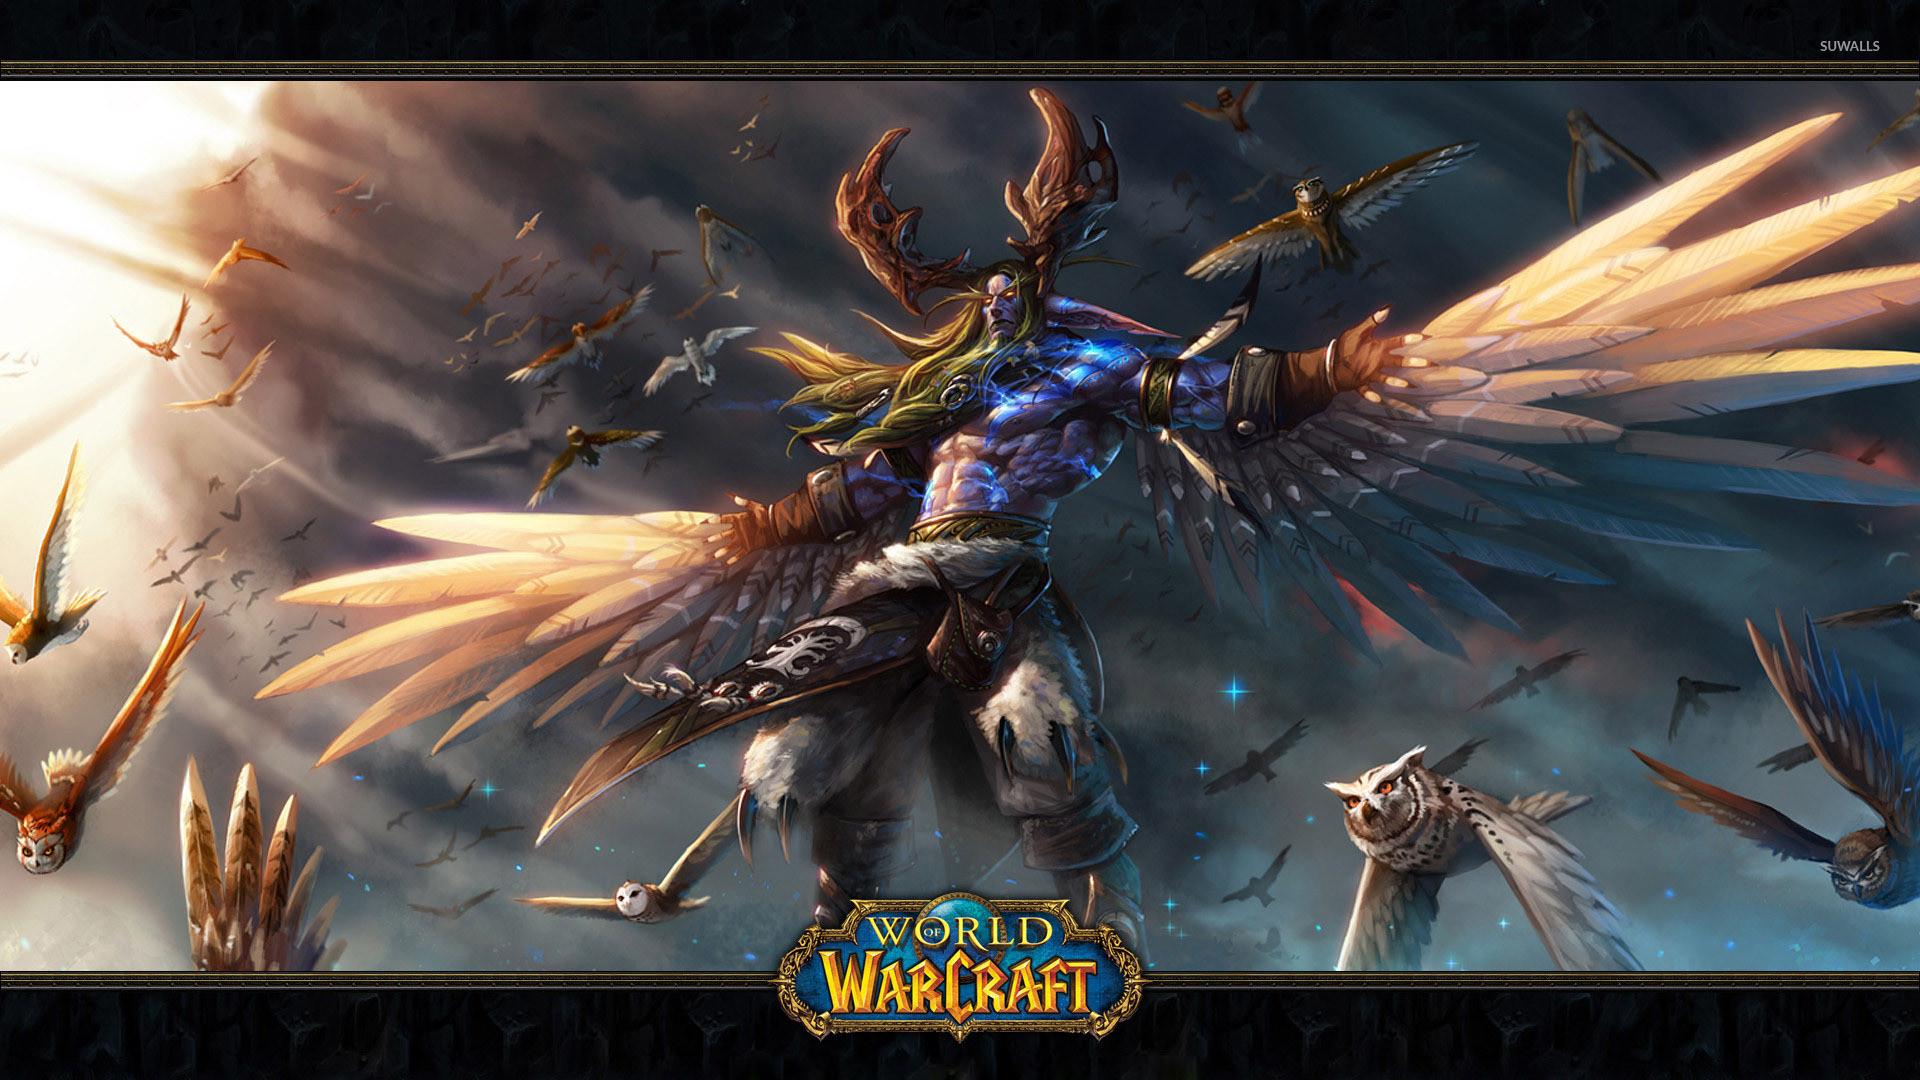 World of Warcraft [6] wallpaper jpg